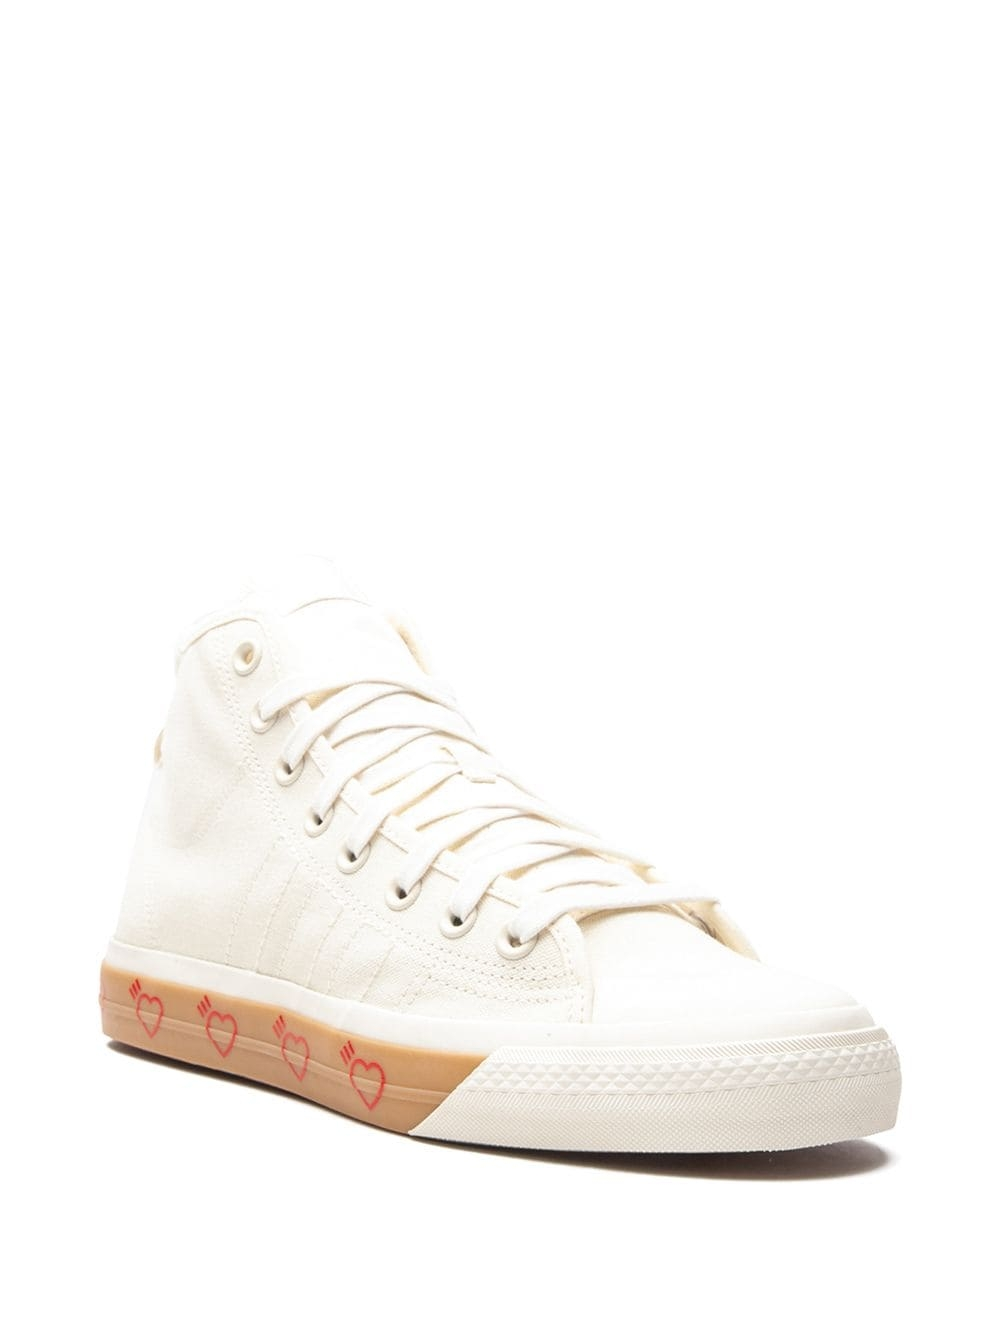 Кроссовки adidas Nizza Hi Human Made Off White